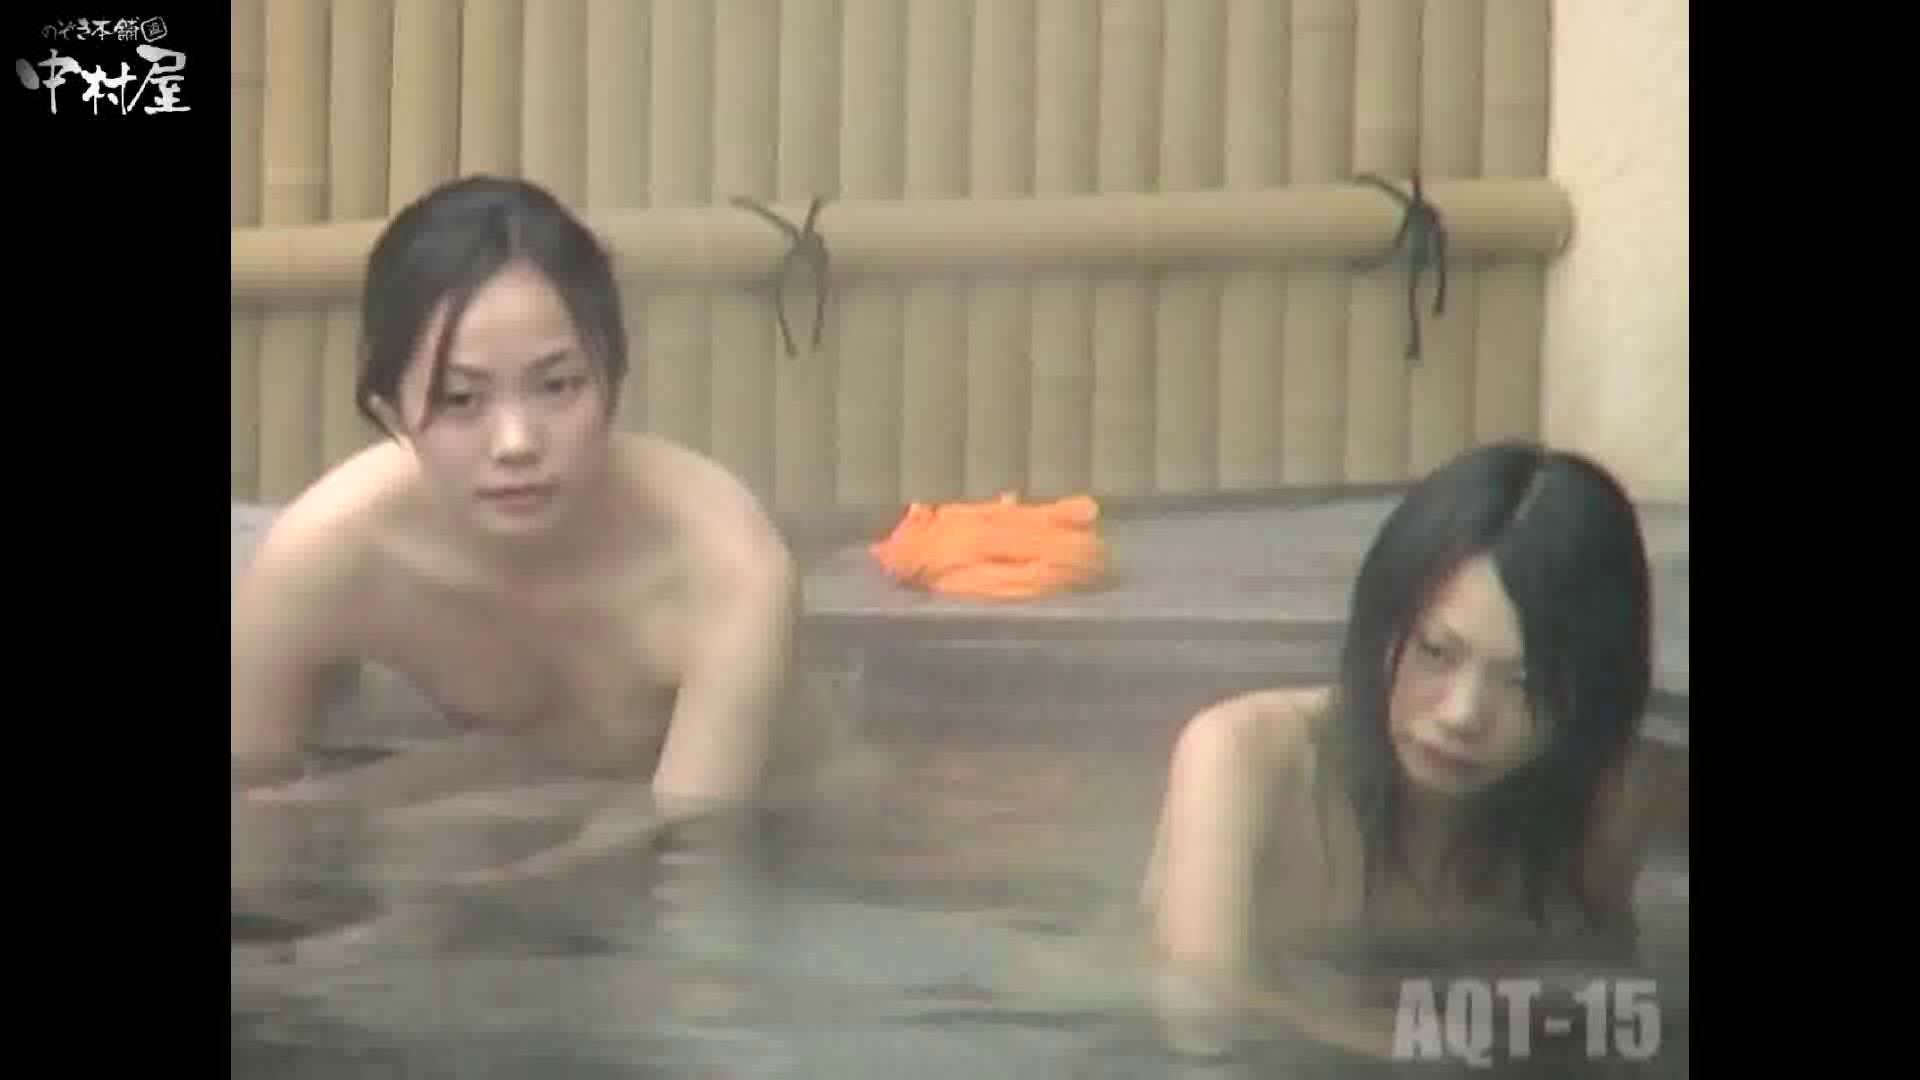 Aquaな露天風呂Vol.878潜入盗撮露天風呂十五判湯 其の八 美しいOLの裸体  95pic 44